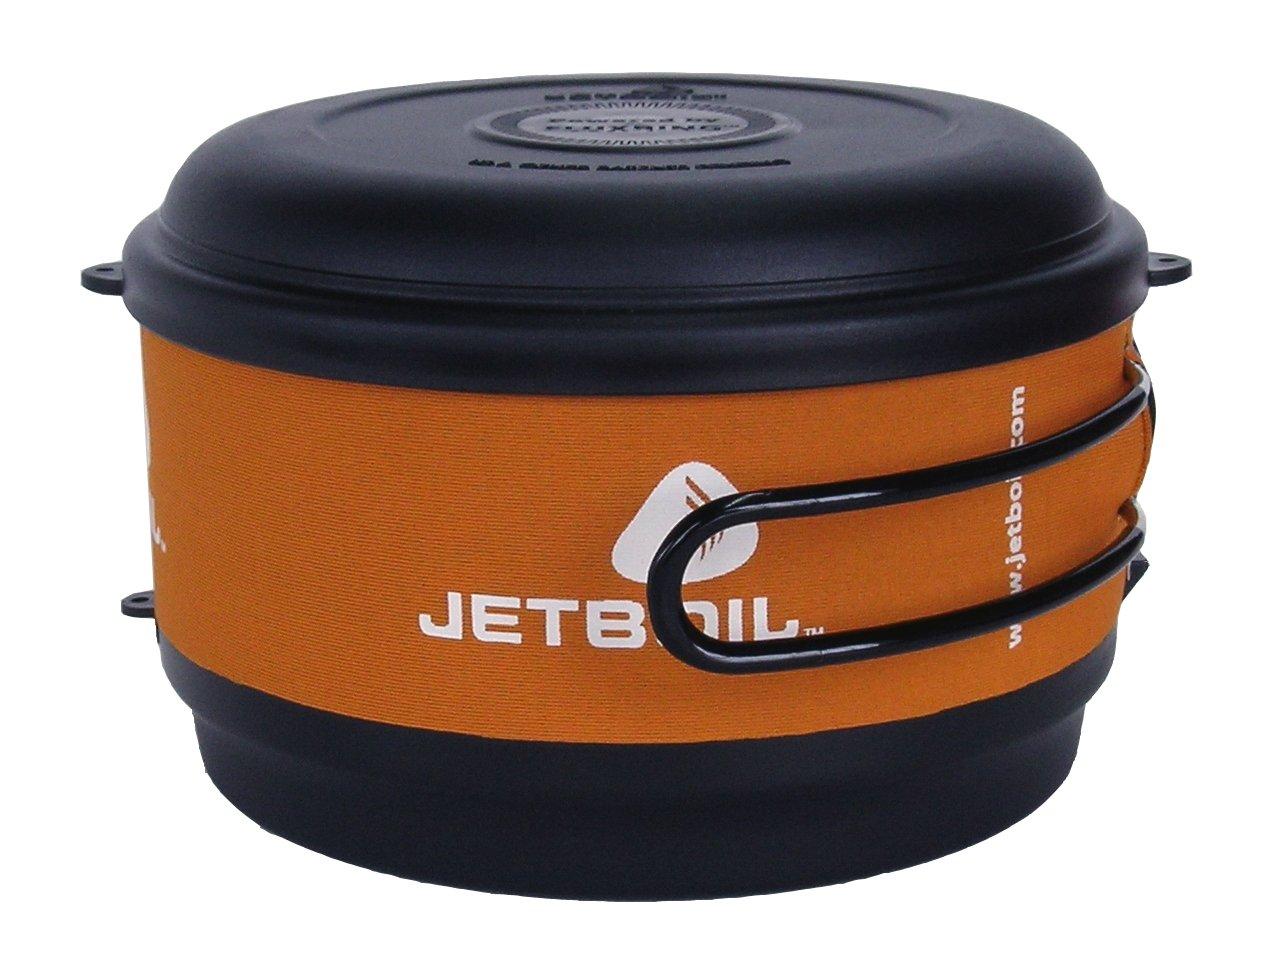 Jetboil Kochtopf FluxRing, Orange, One Größe, CCP150-EU